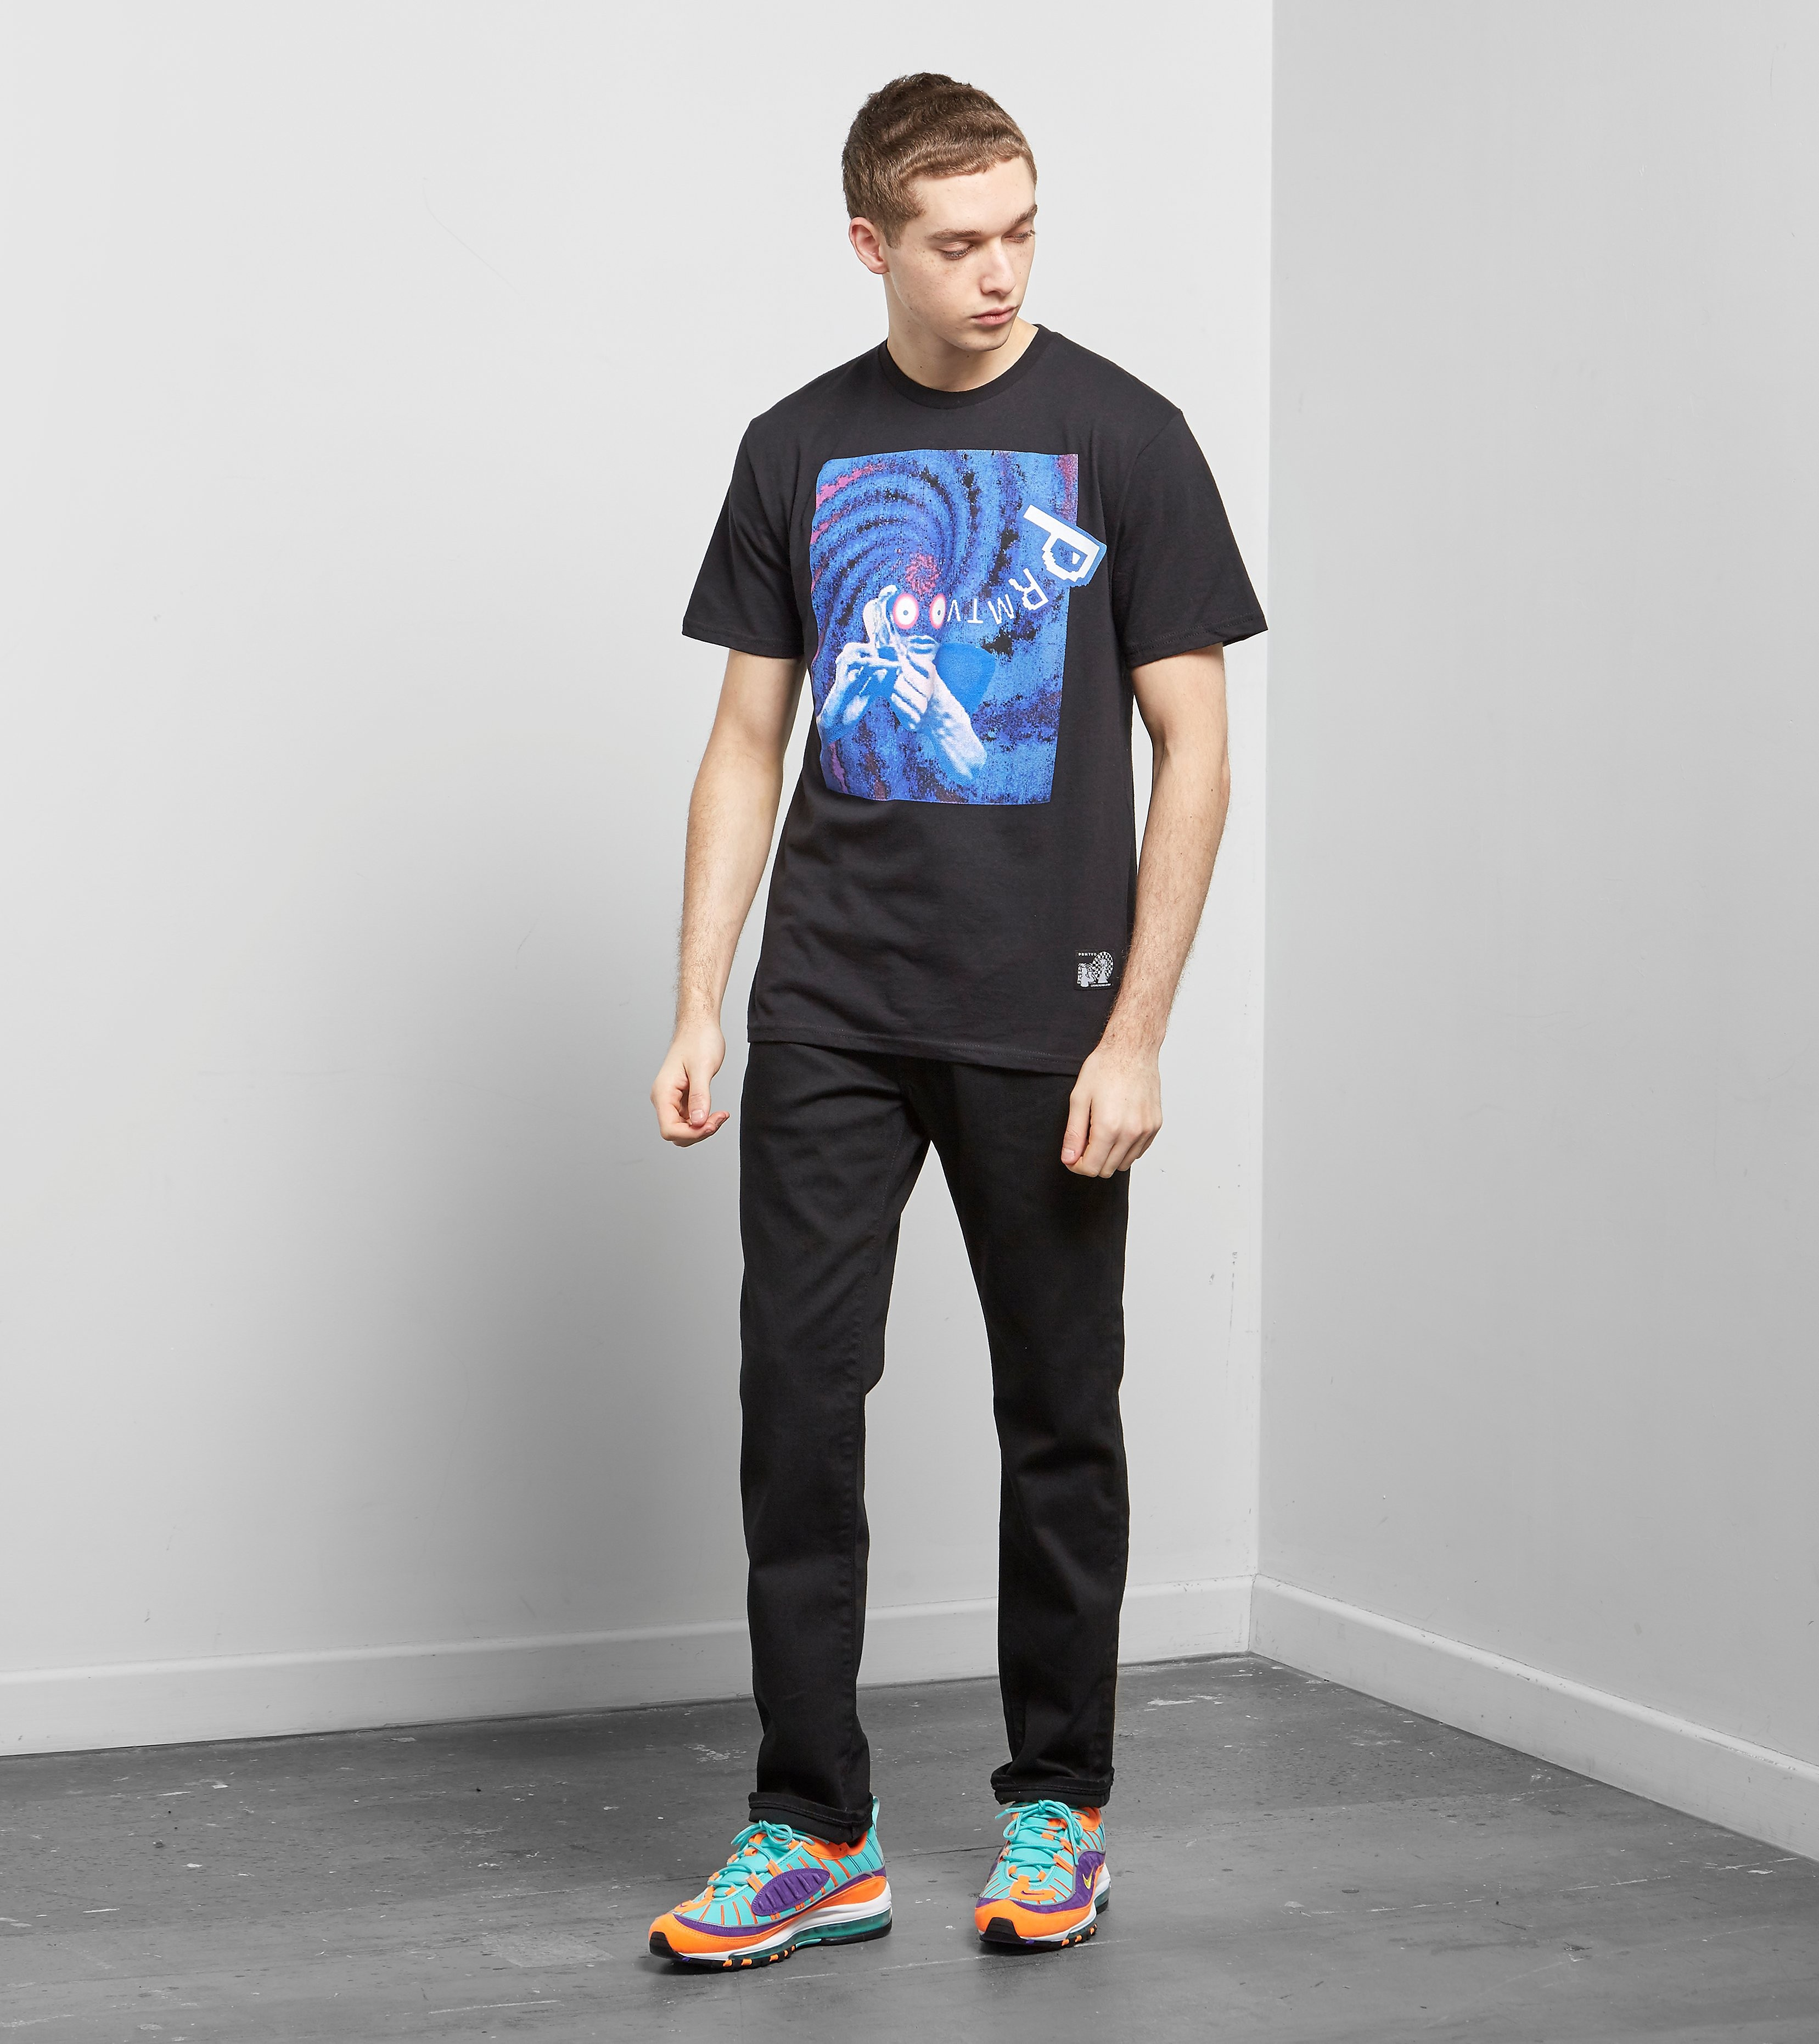 PRMTVO Zooted T-Shirt